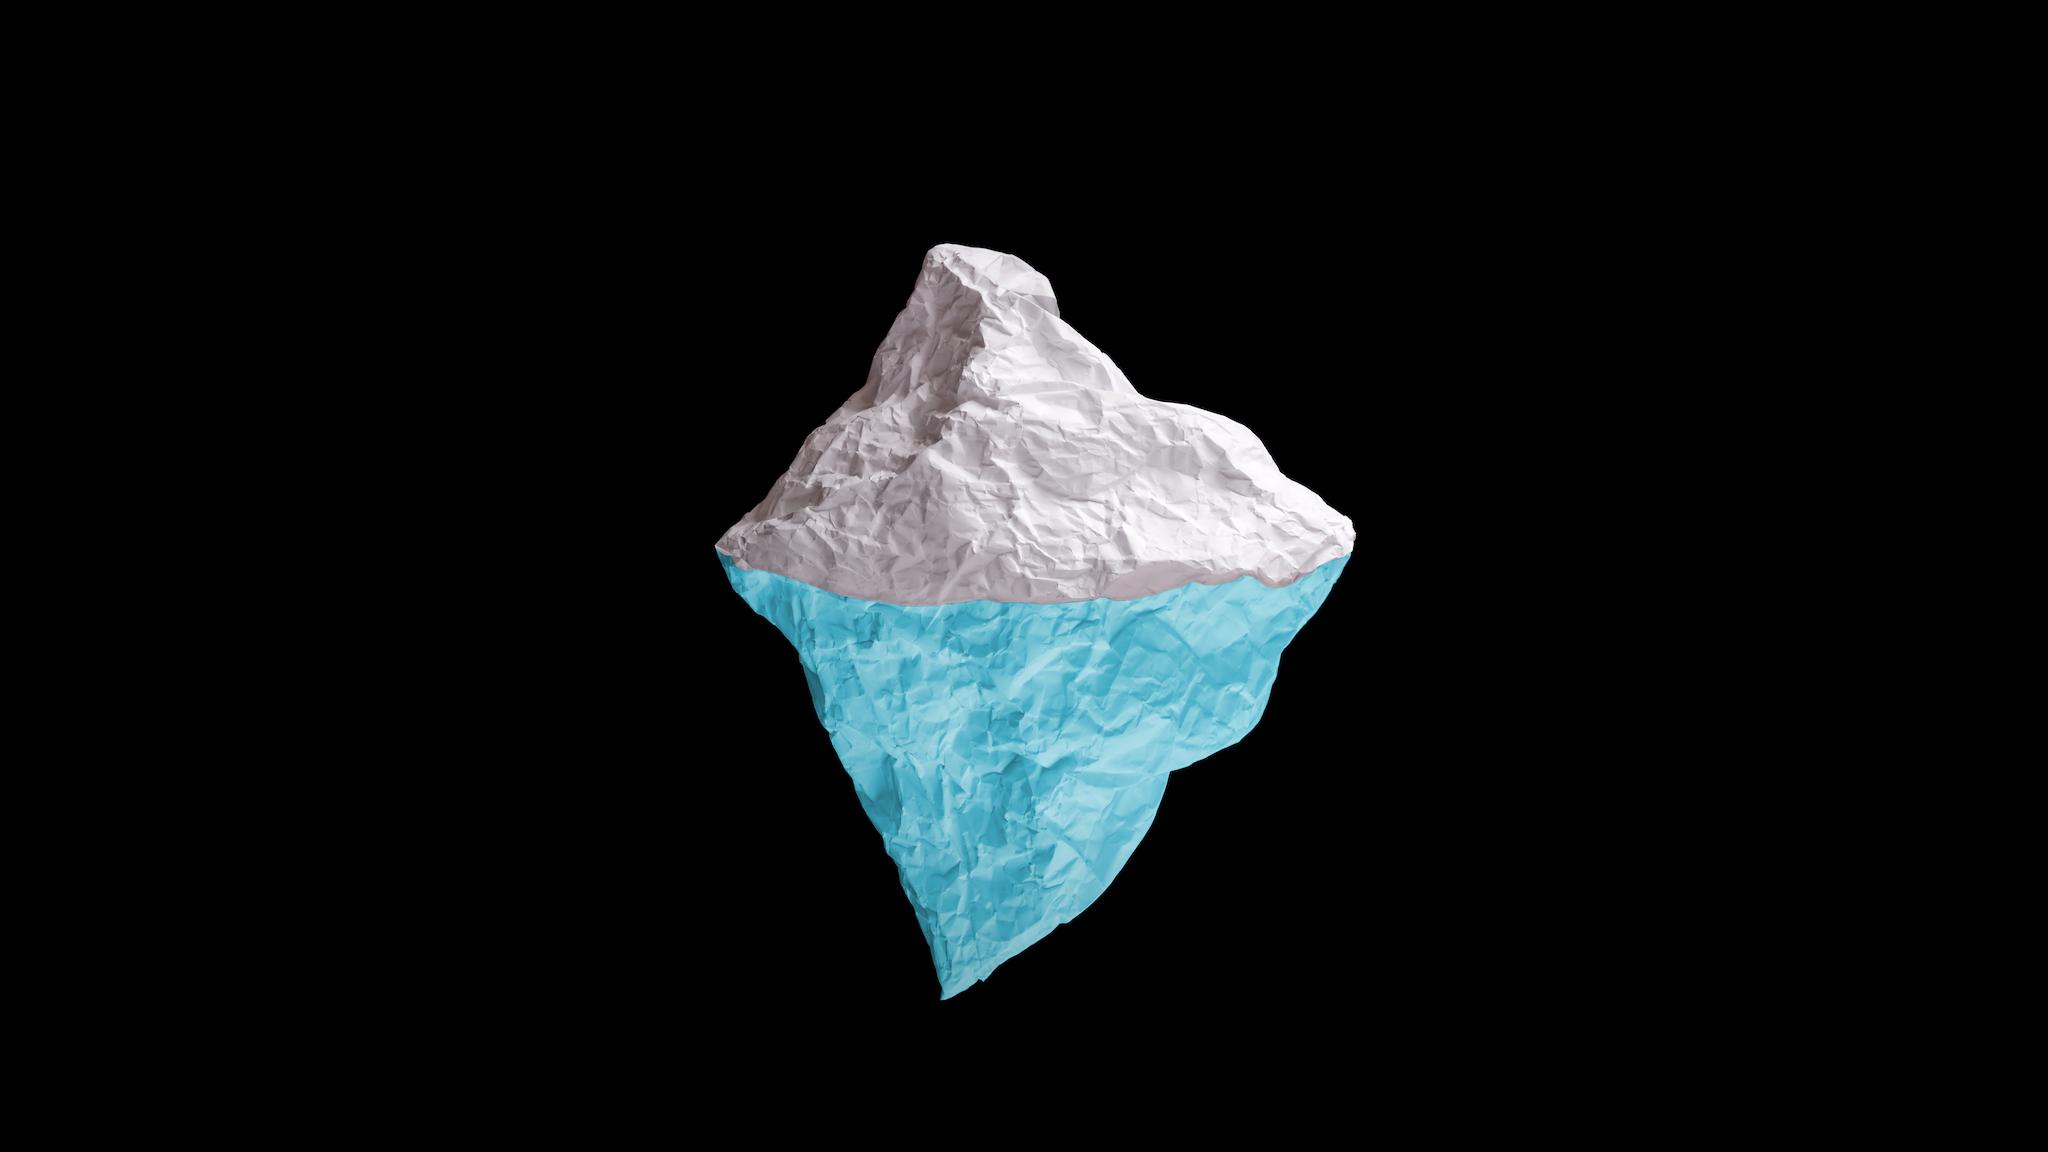 Iceberg 16x9 Final web.jpeg